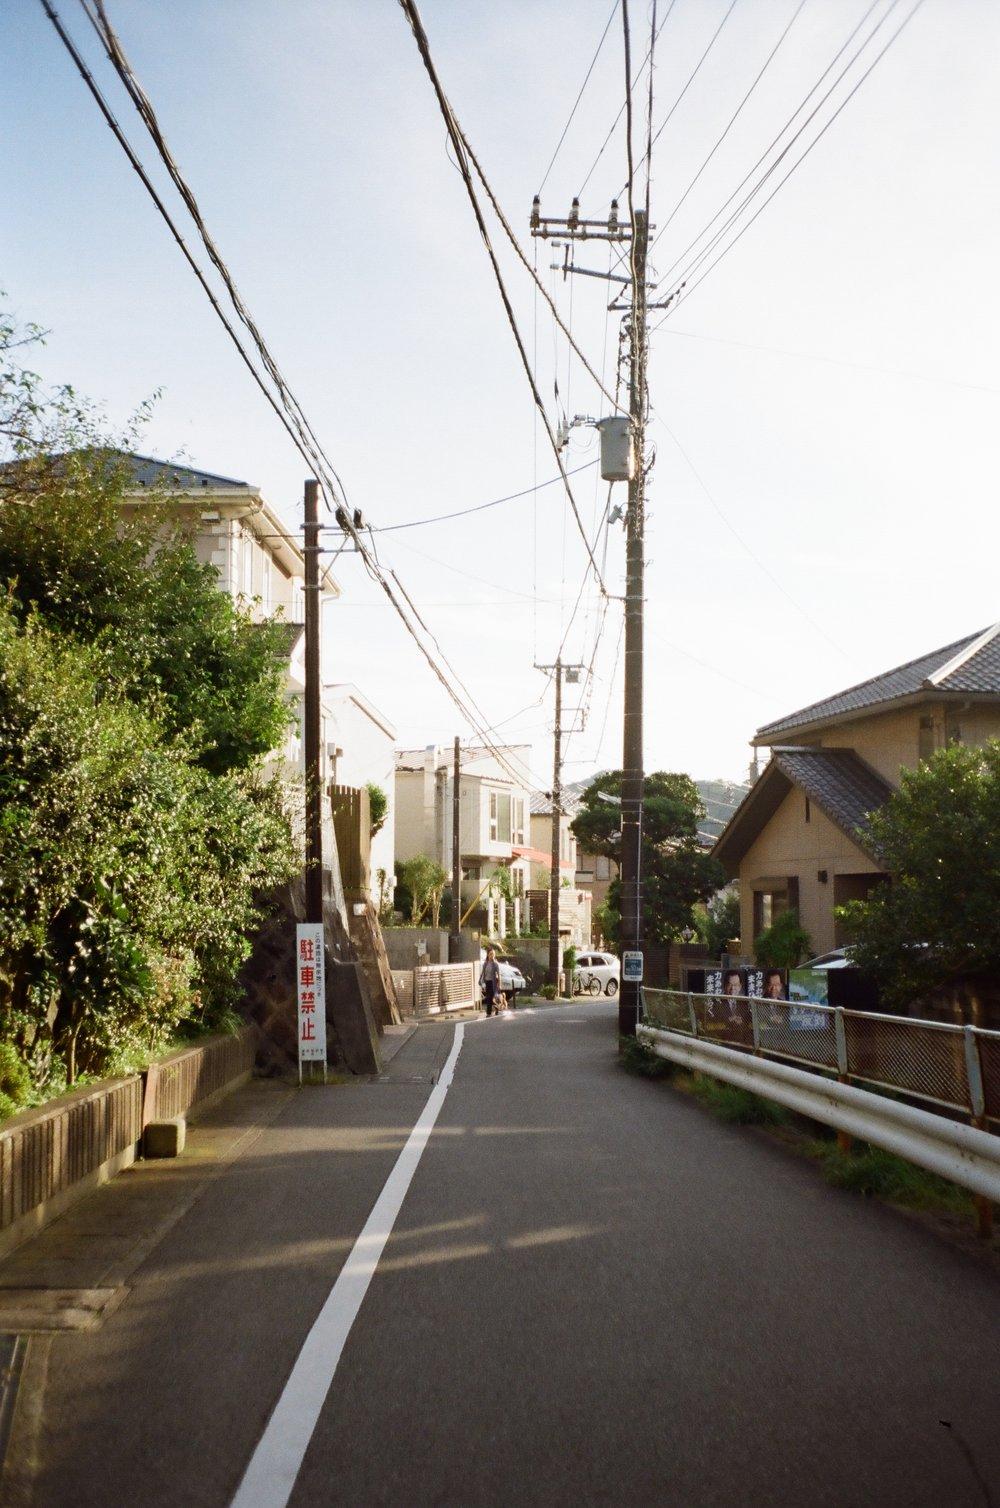 08-JAPON-argentic-Kamakura-octobre-2016-0018.jpg